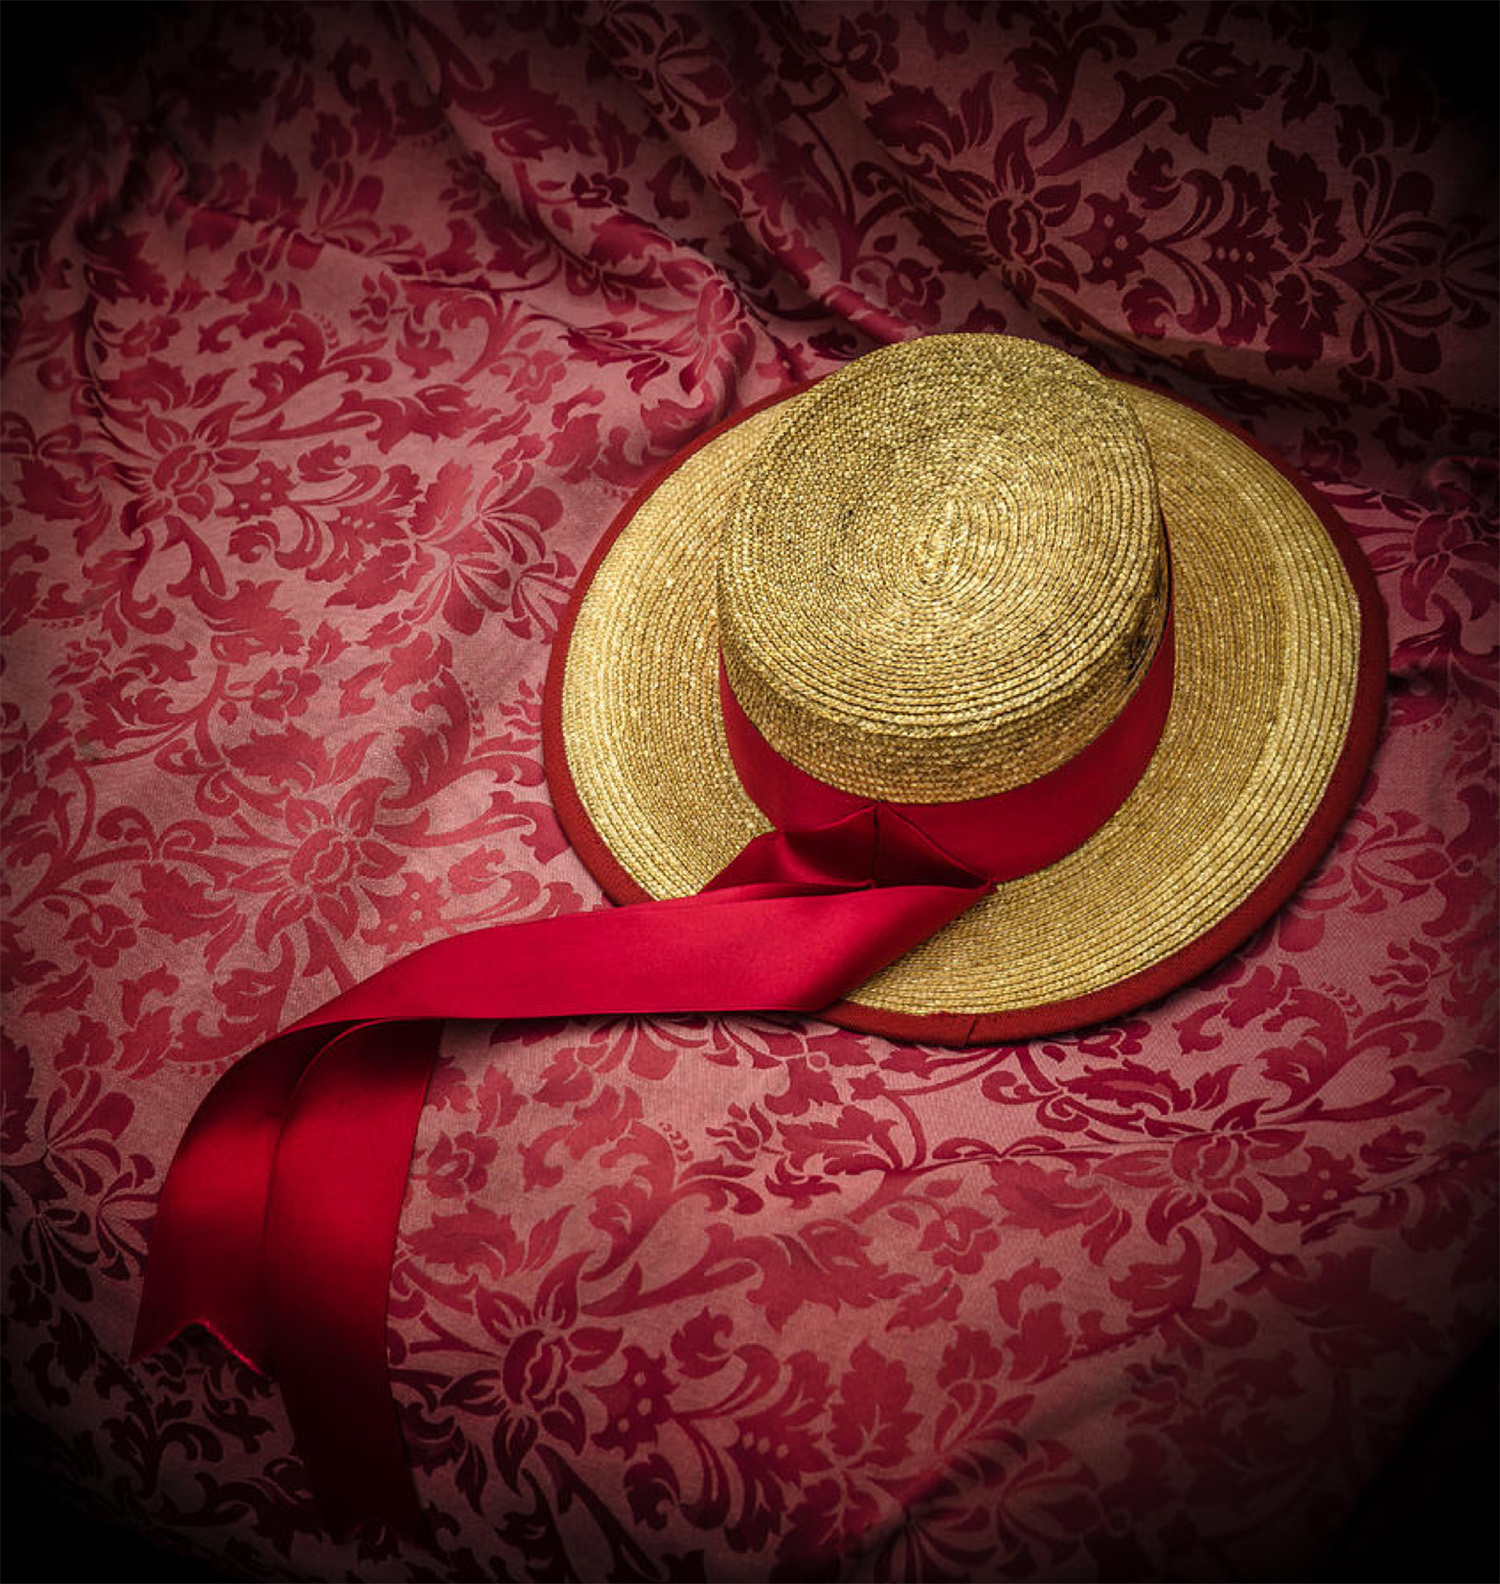 Gondolier's Hat